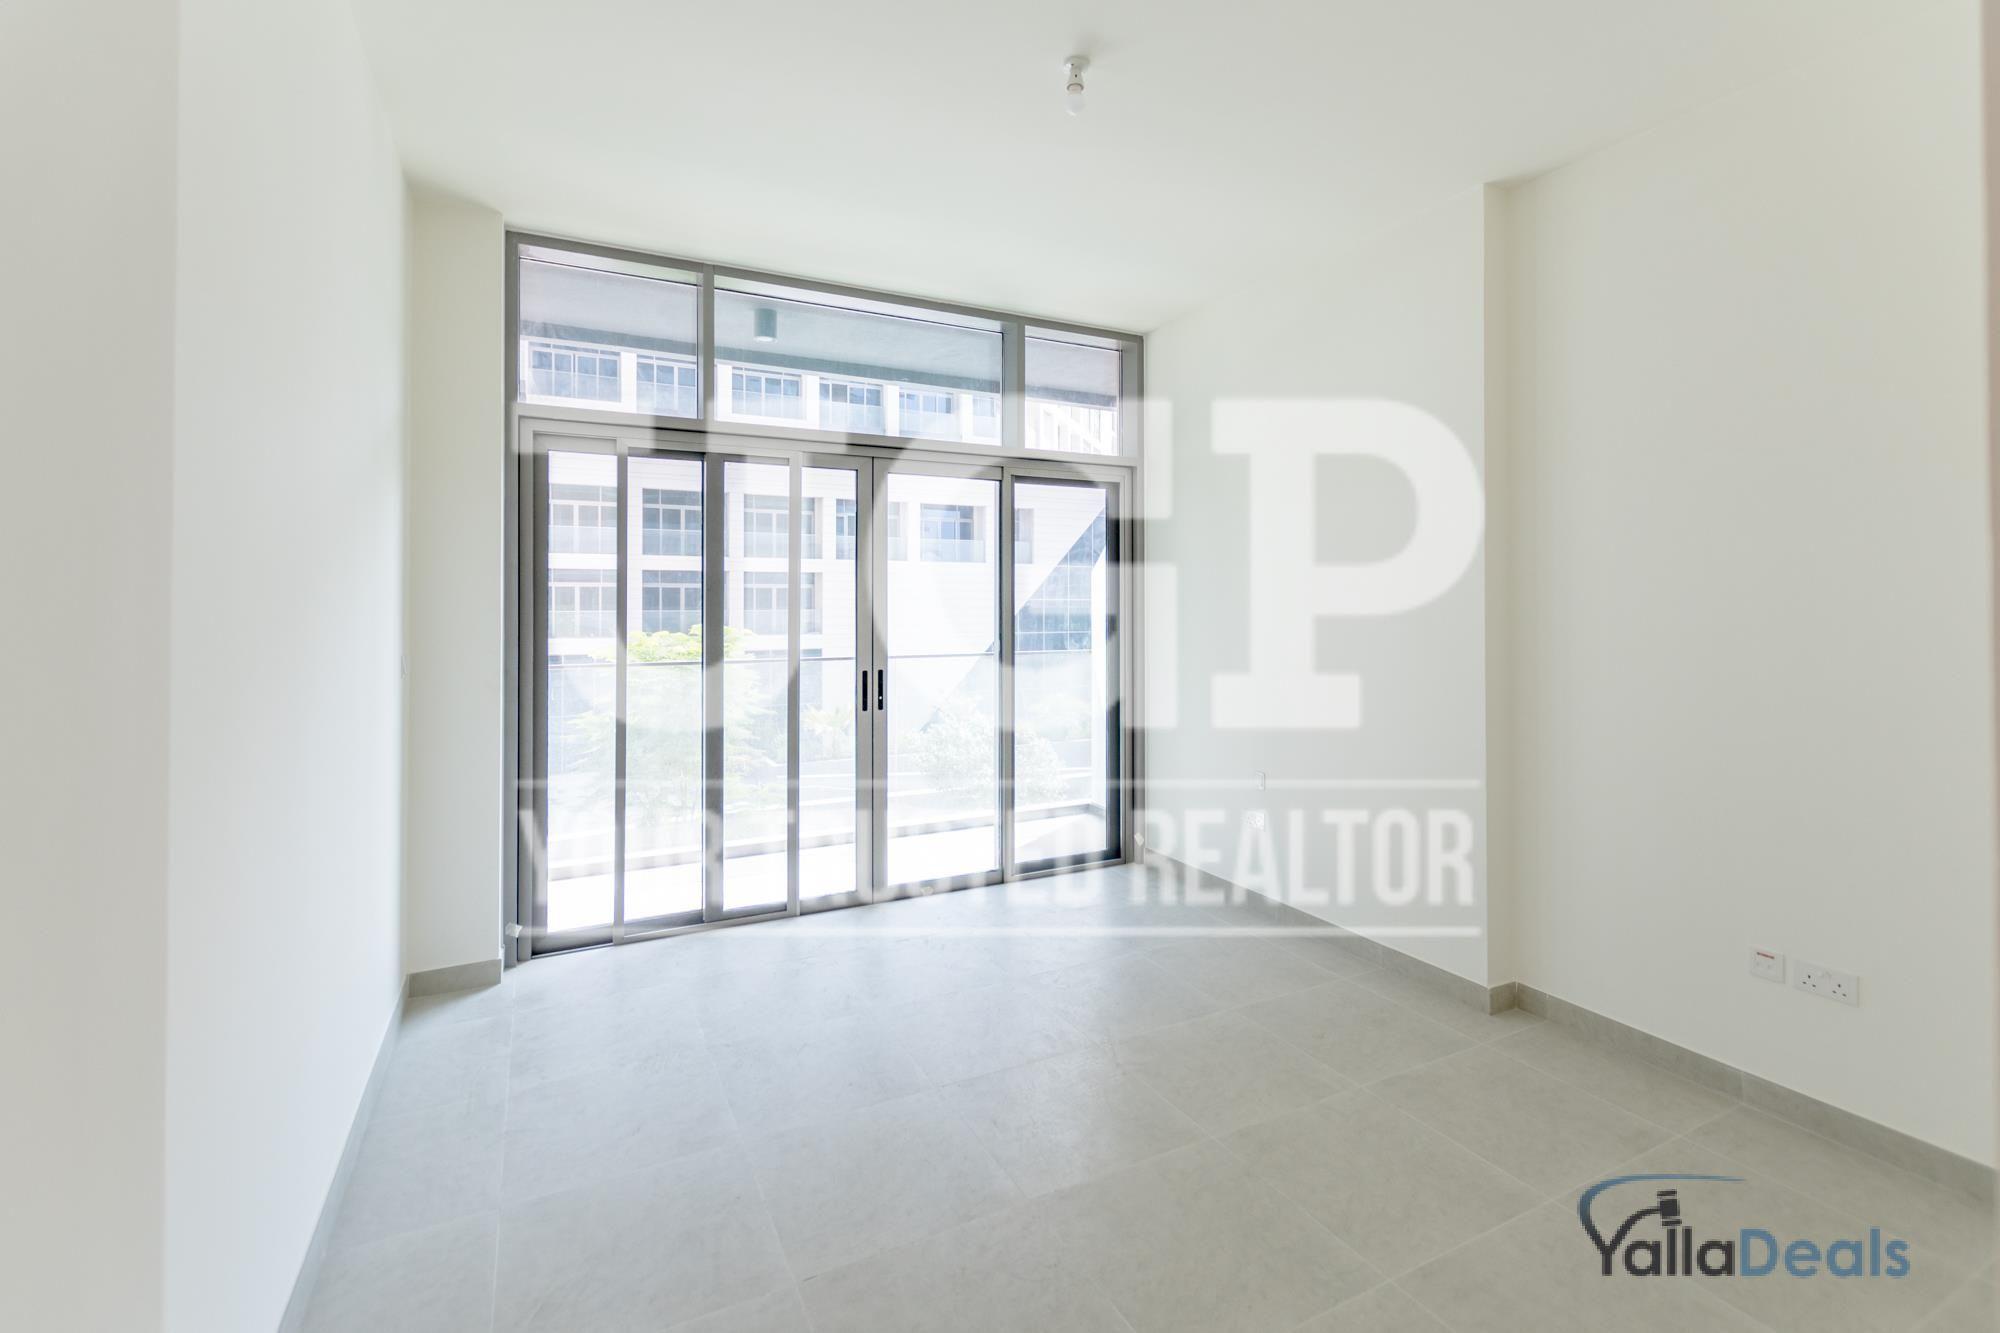 Real Estate_Apartments for Rent_Saadiyat Island